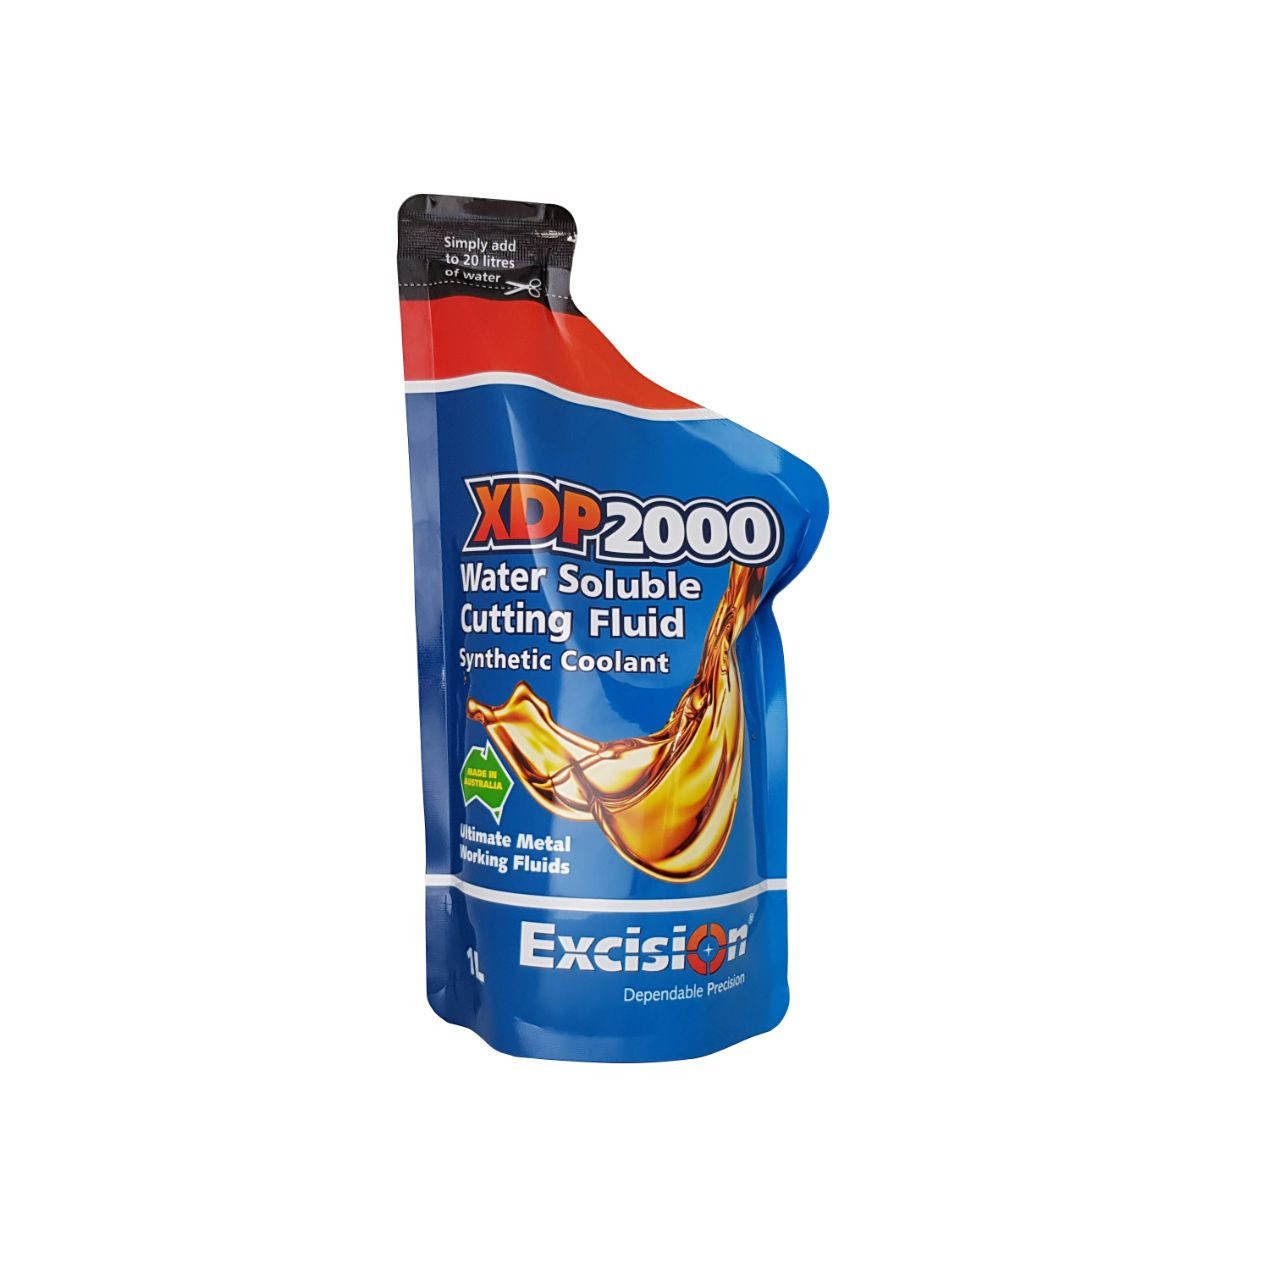 Excision XDP2000 Cutting Fluid 1L